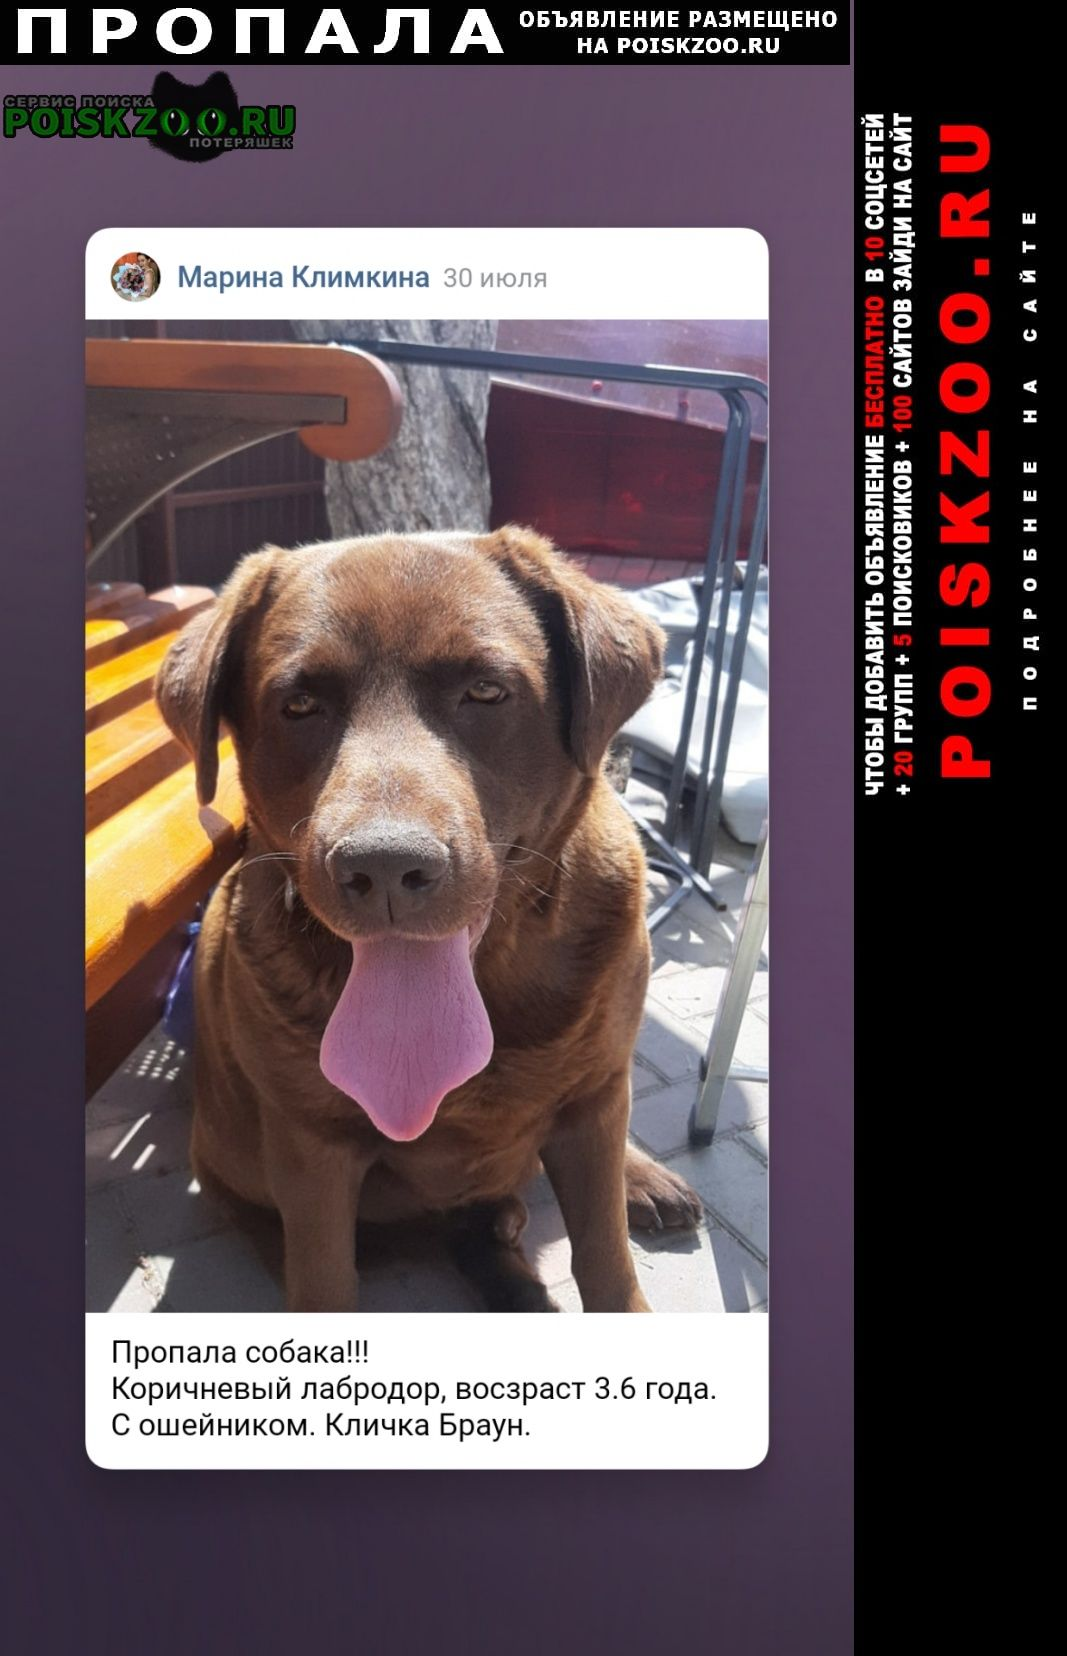 Пропала собака ищу лабродора Пенза